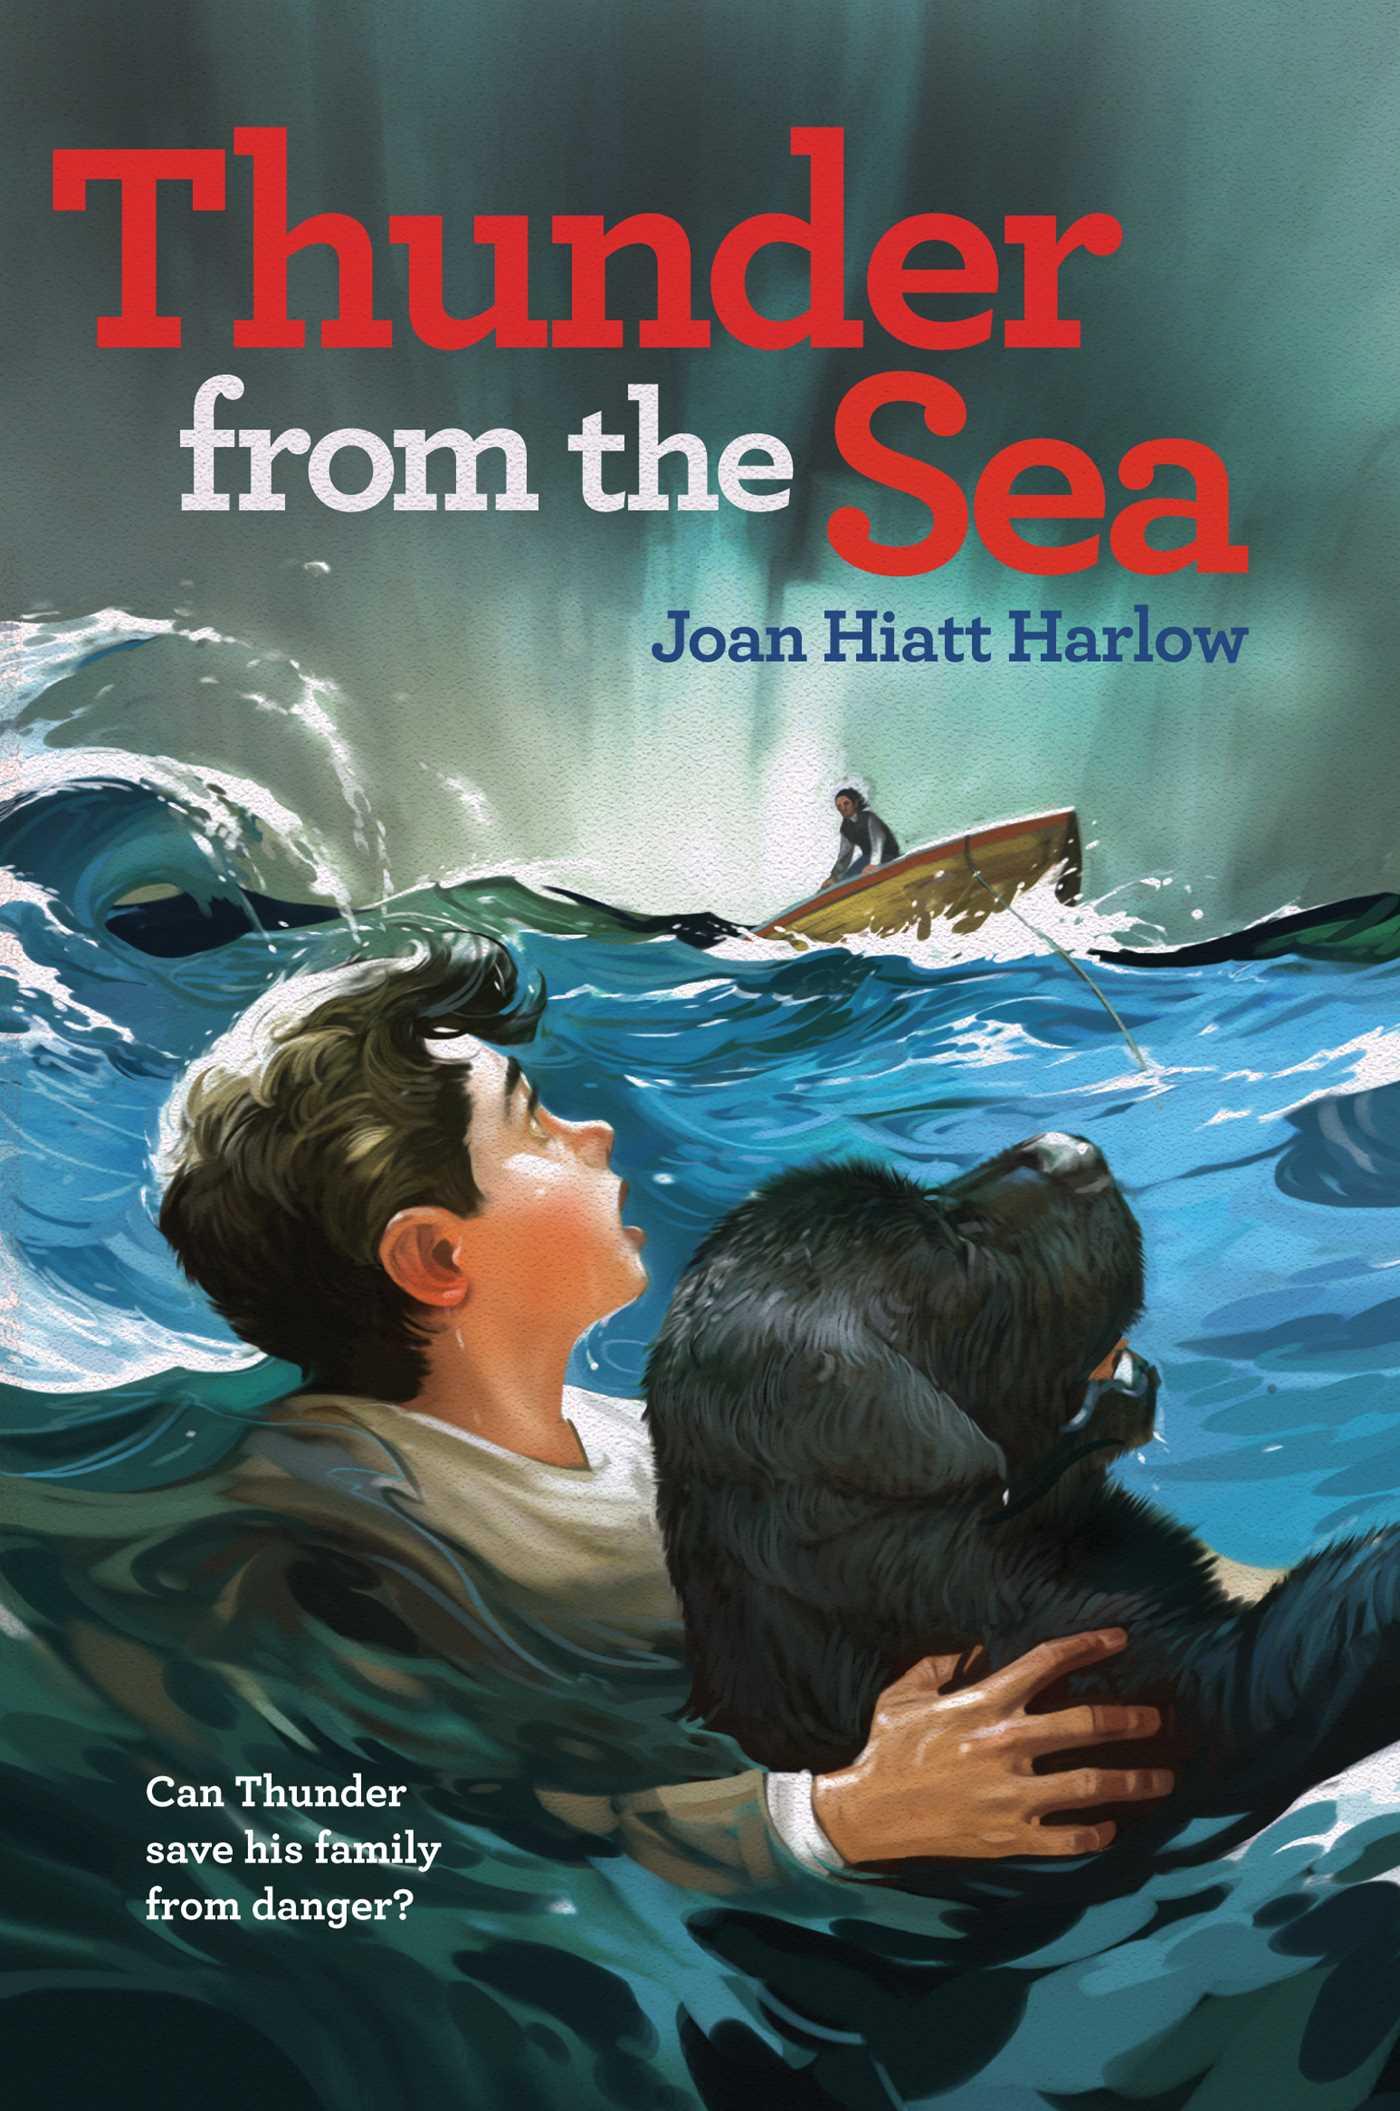 star in the storm harlow joan hiatt